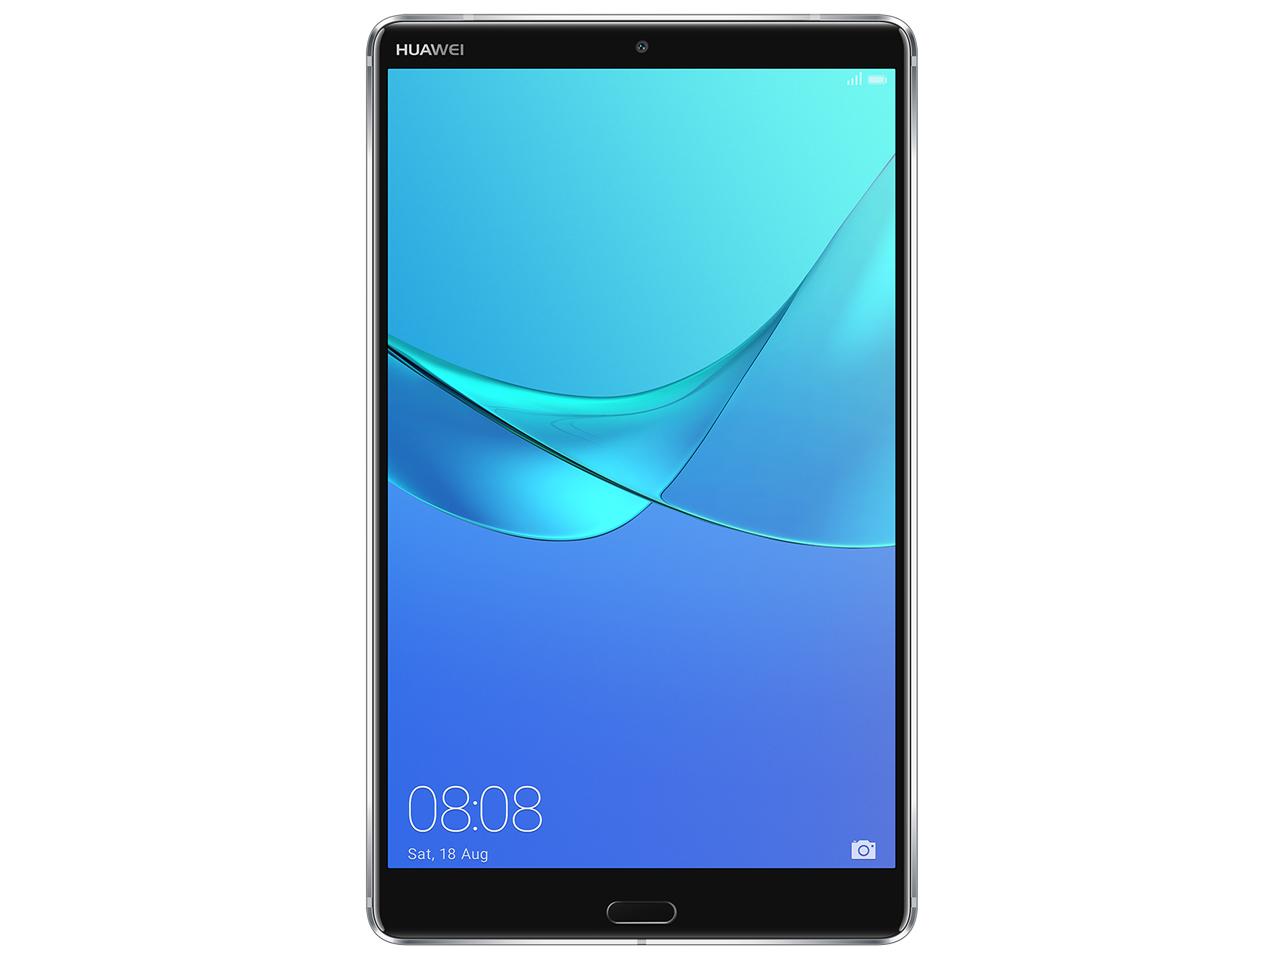 MediaPad M5 LTEモデル SHT-AL09 SIMフリー HUAWEI 8.4インチ タブレット JAN:6901443224890